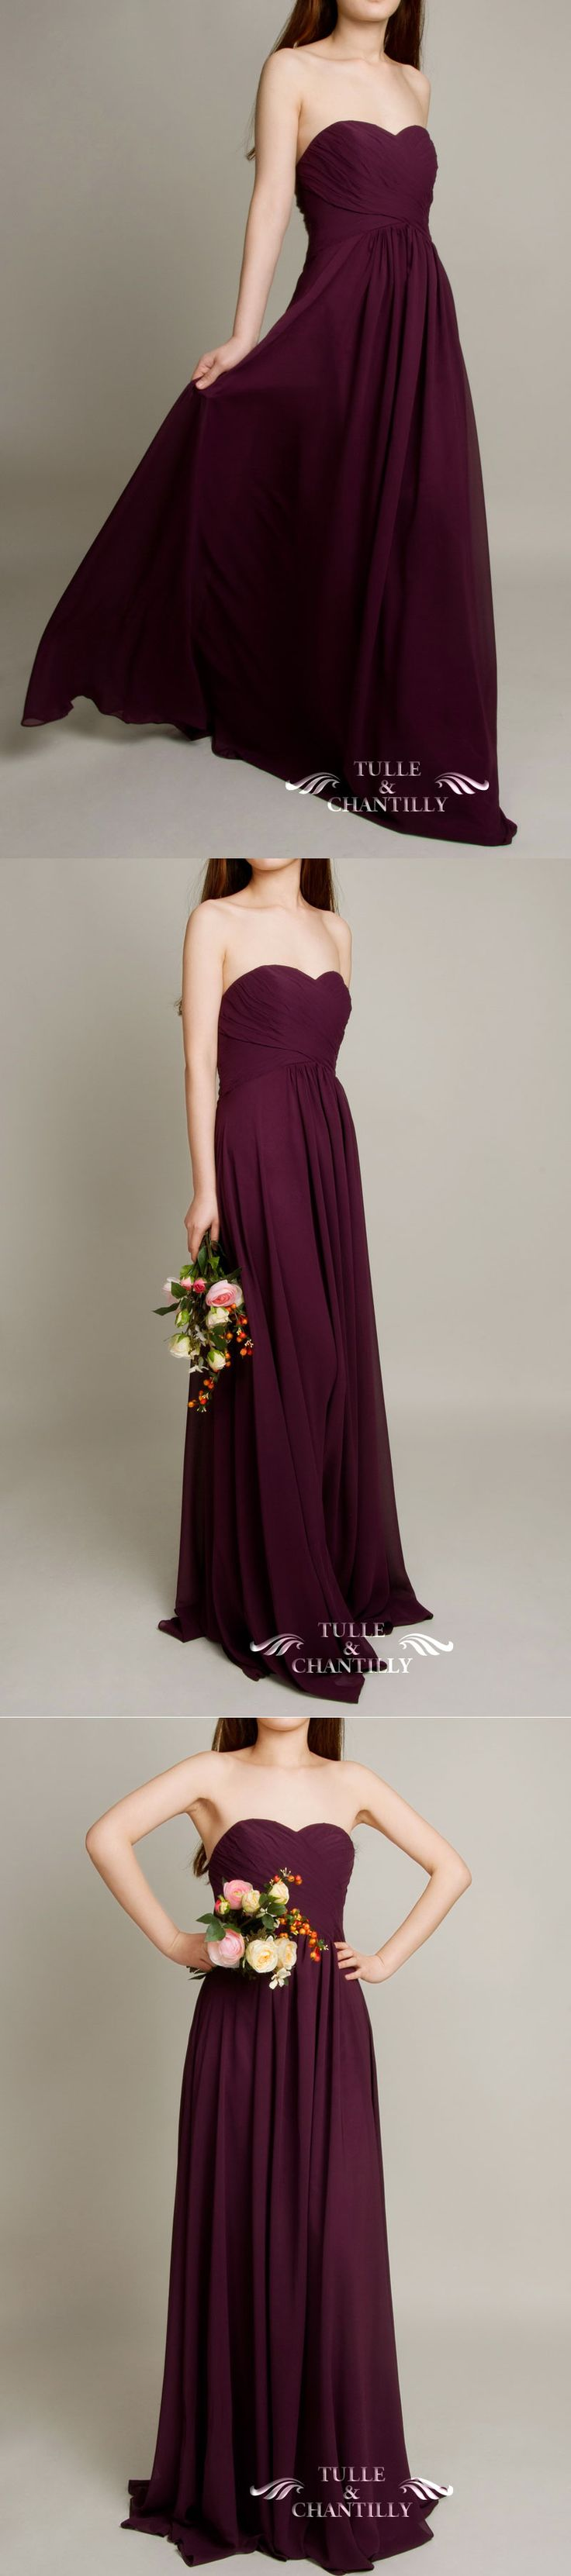 Best 25 dark purple bridesmaid dresses ideas on pinterest dark purple wedding color ideas and long sweetheart aubergine dark purple bridesmaid dress ombrellifo Images